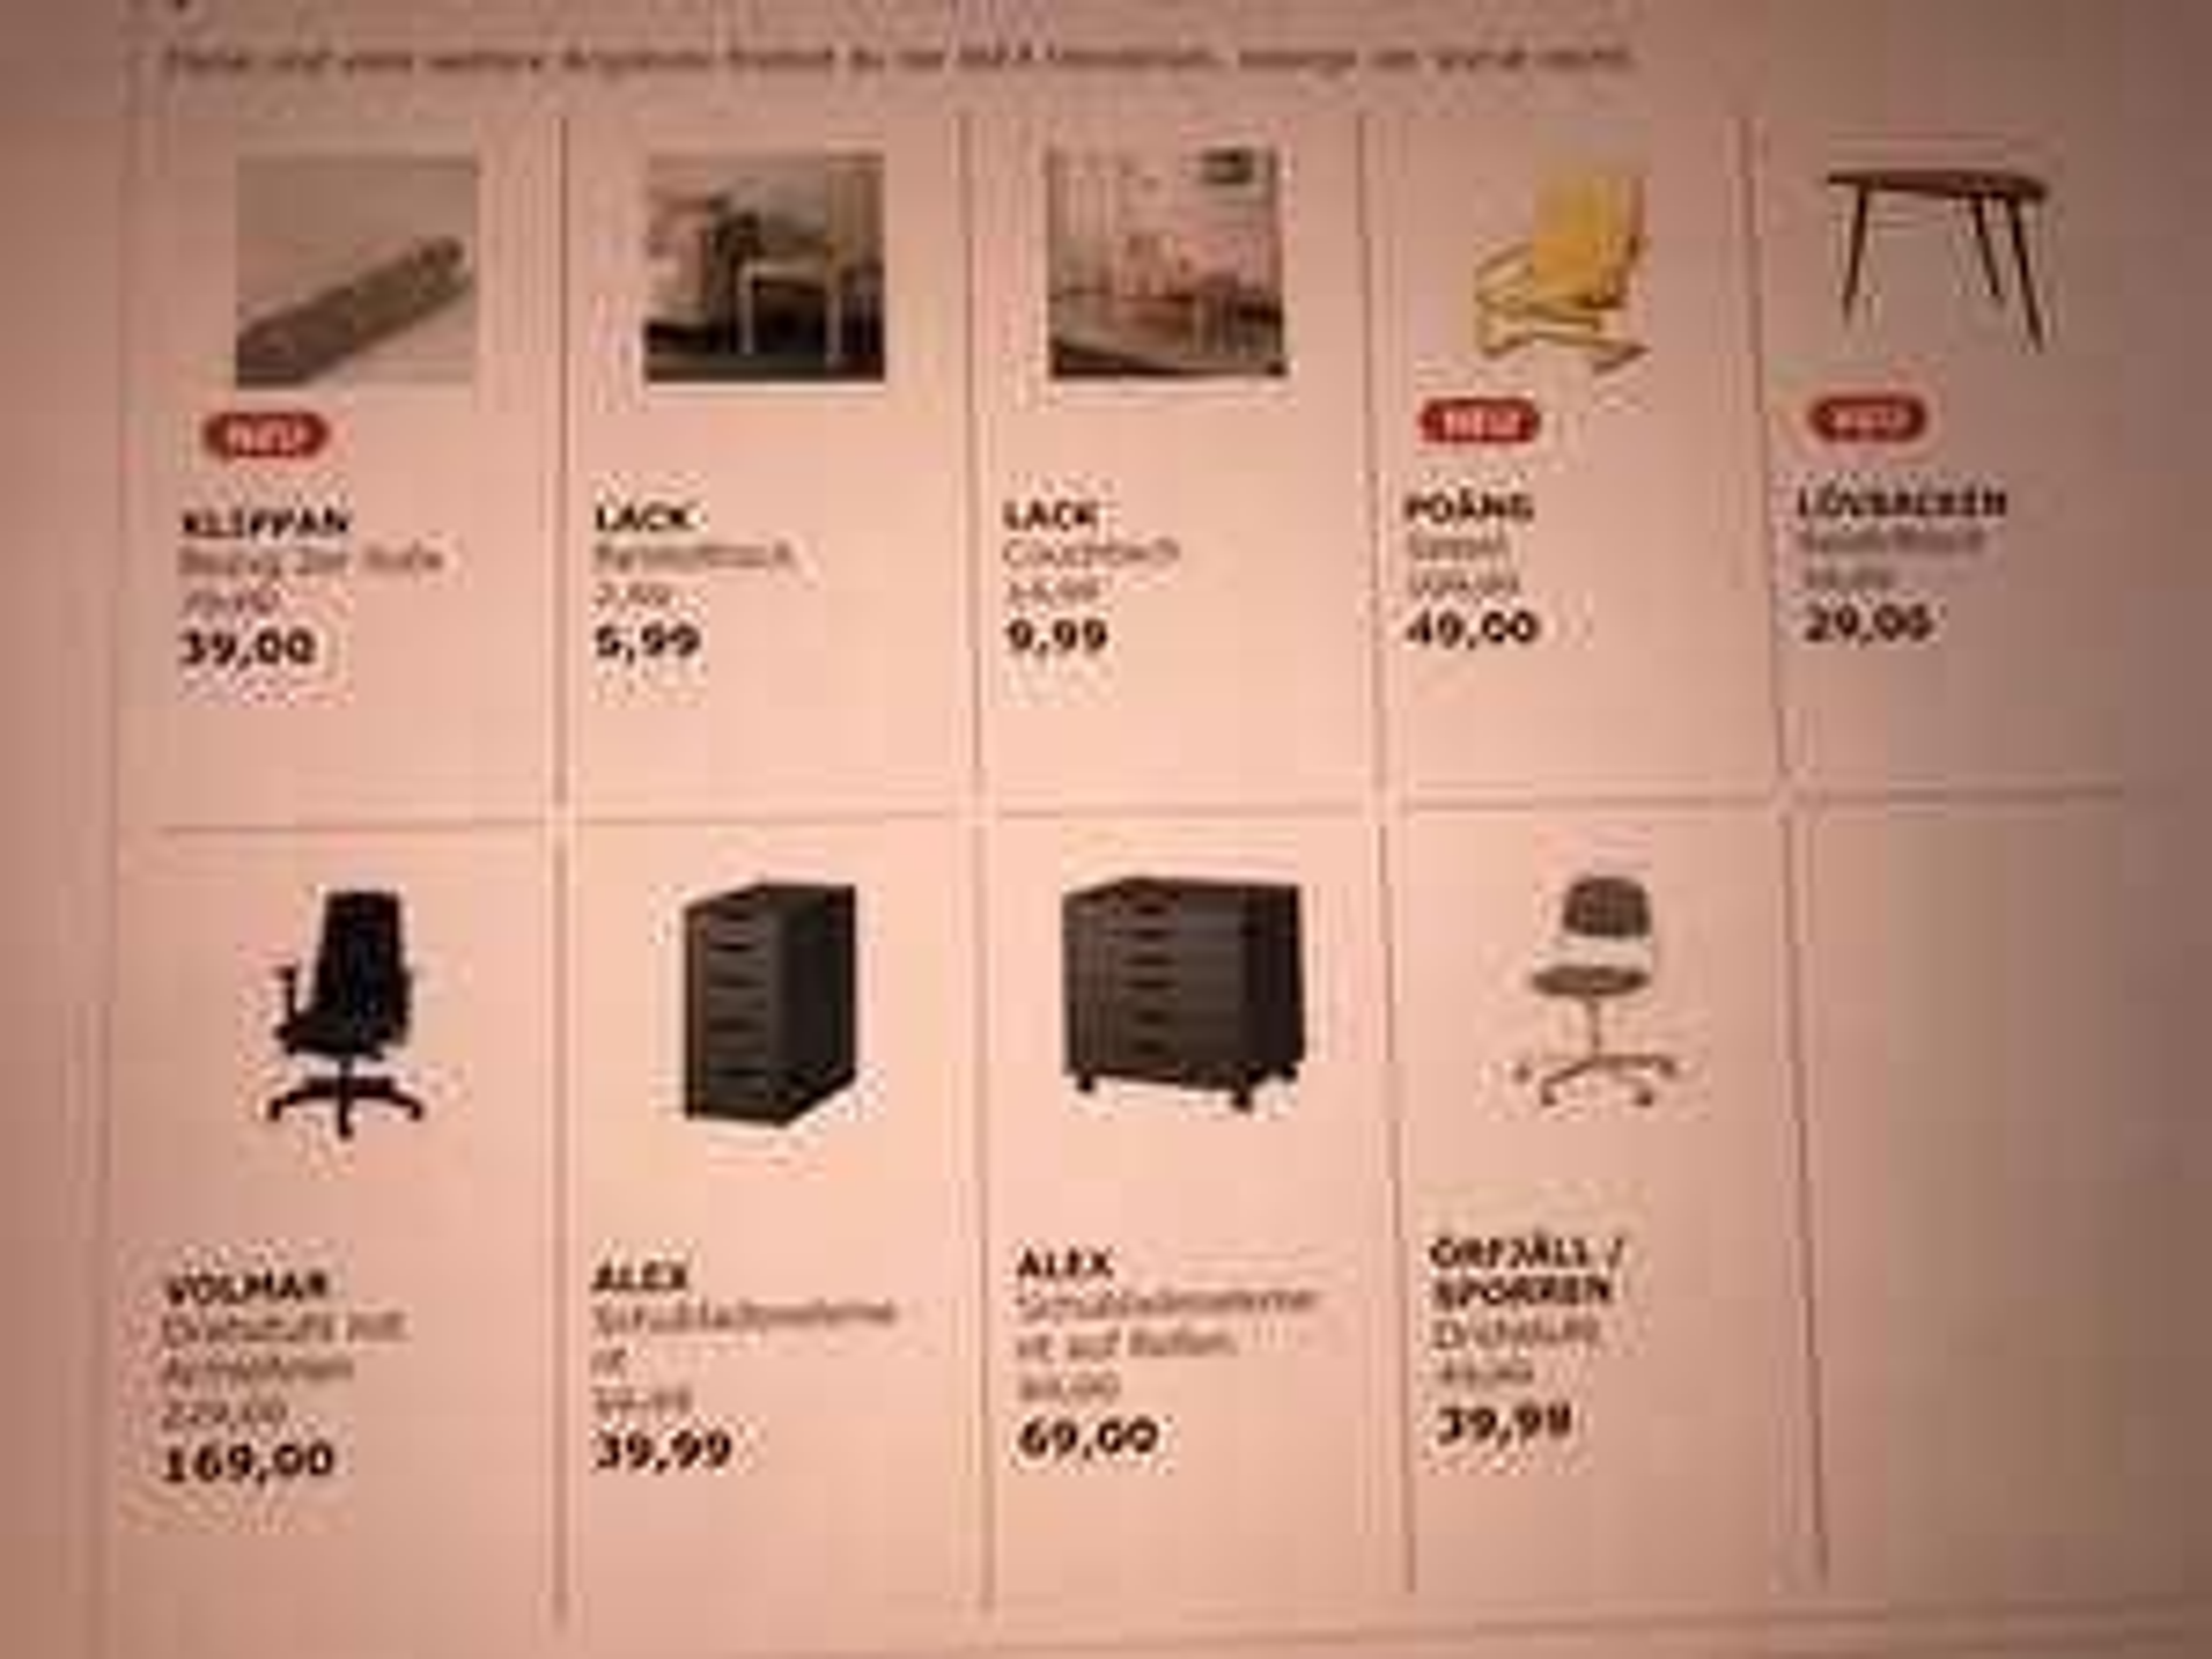 [Lokal] Ikea Osnabrück - Bürostuhl Volmar mit Armlehnen